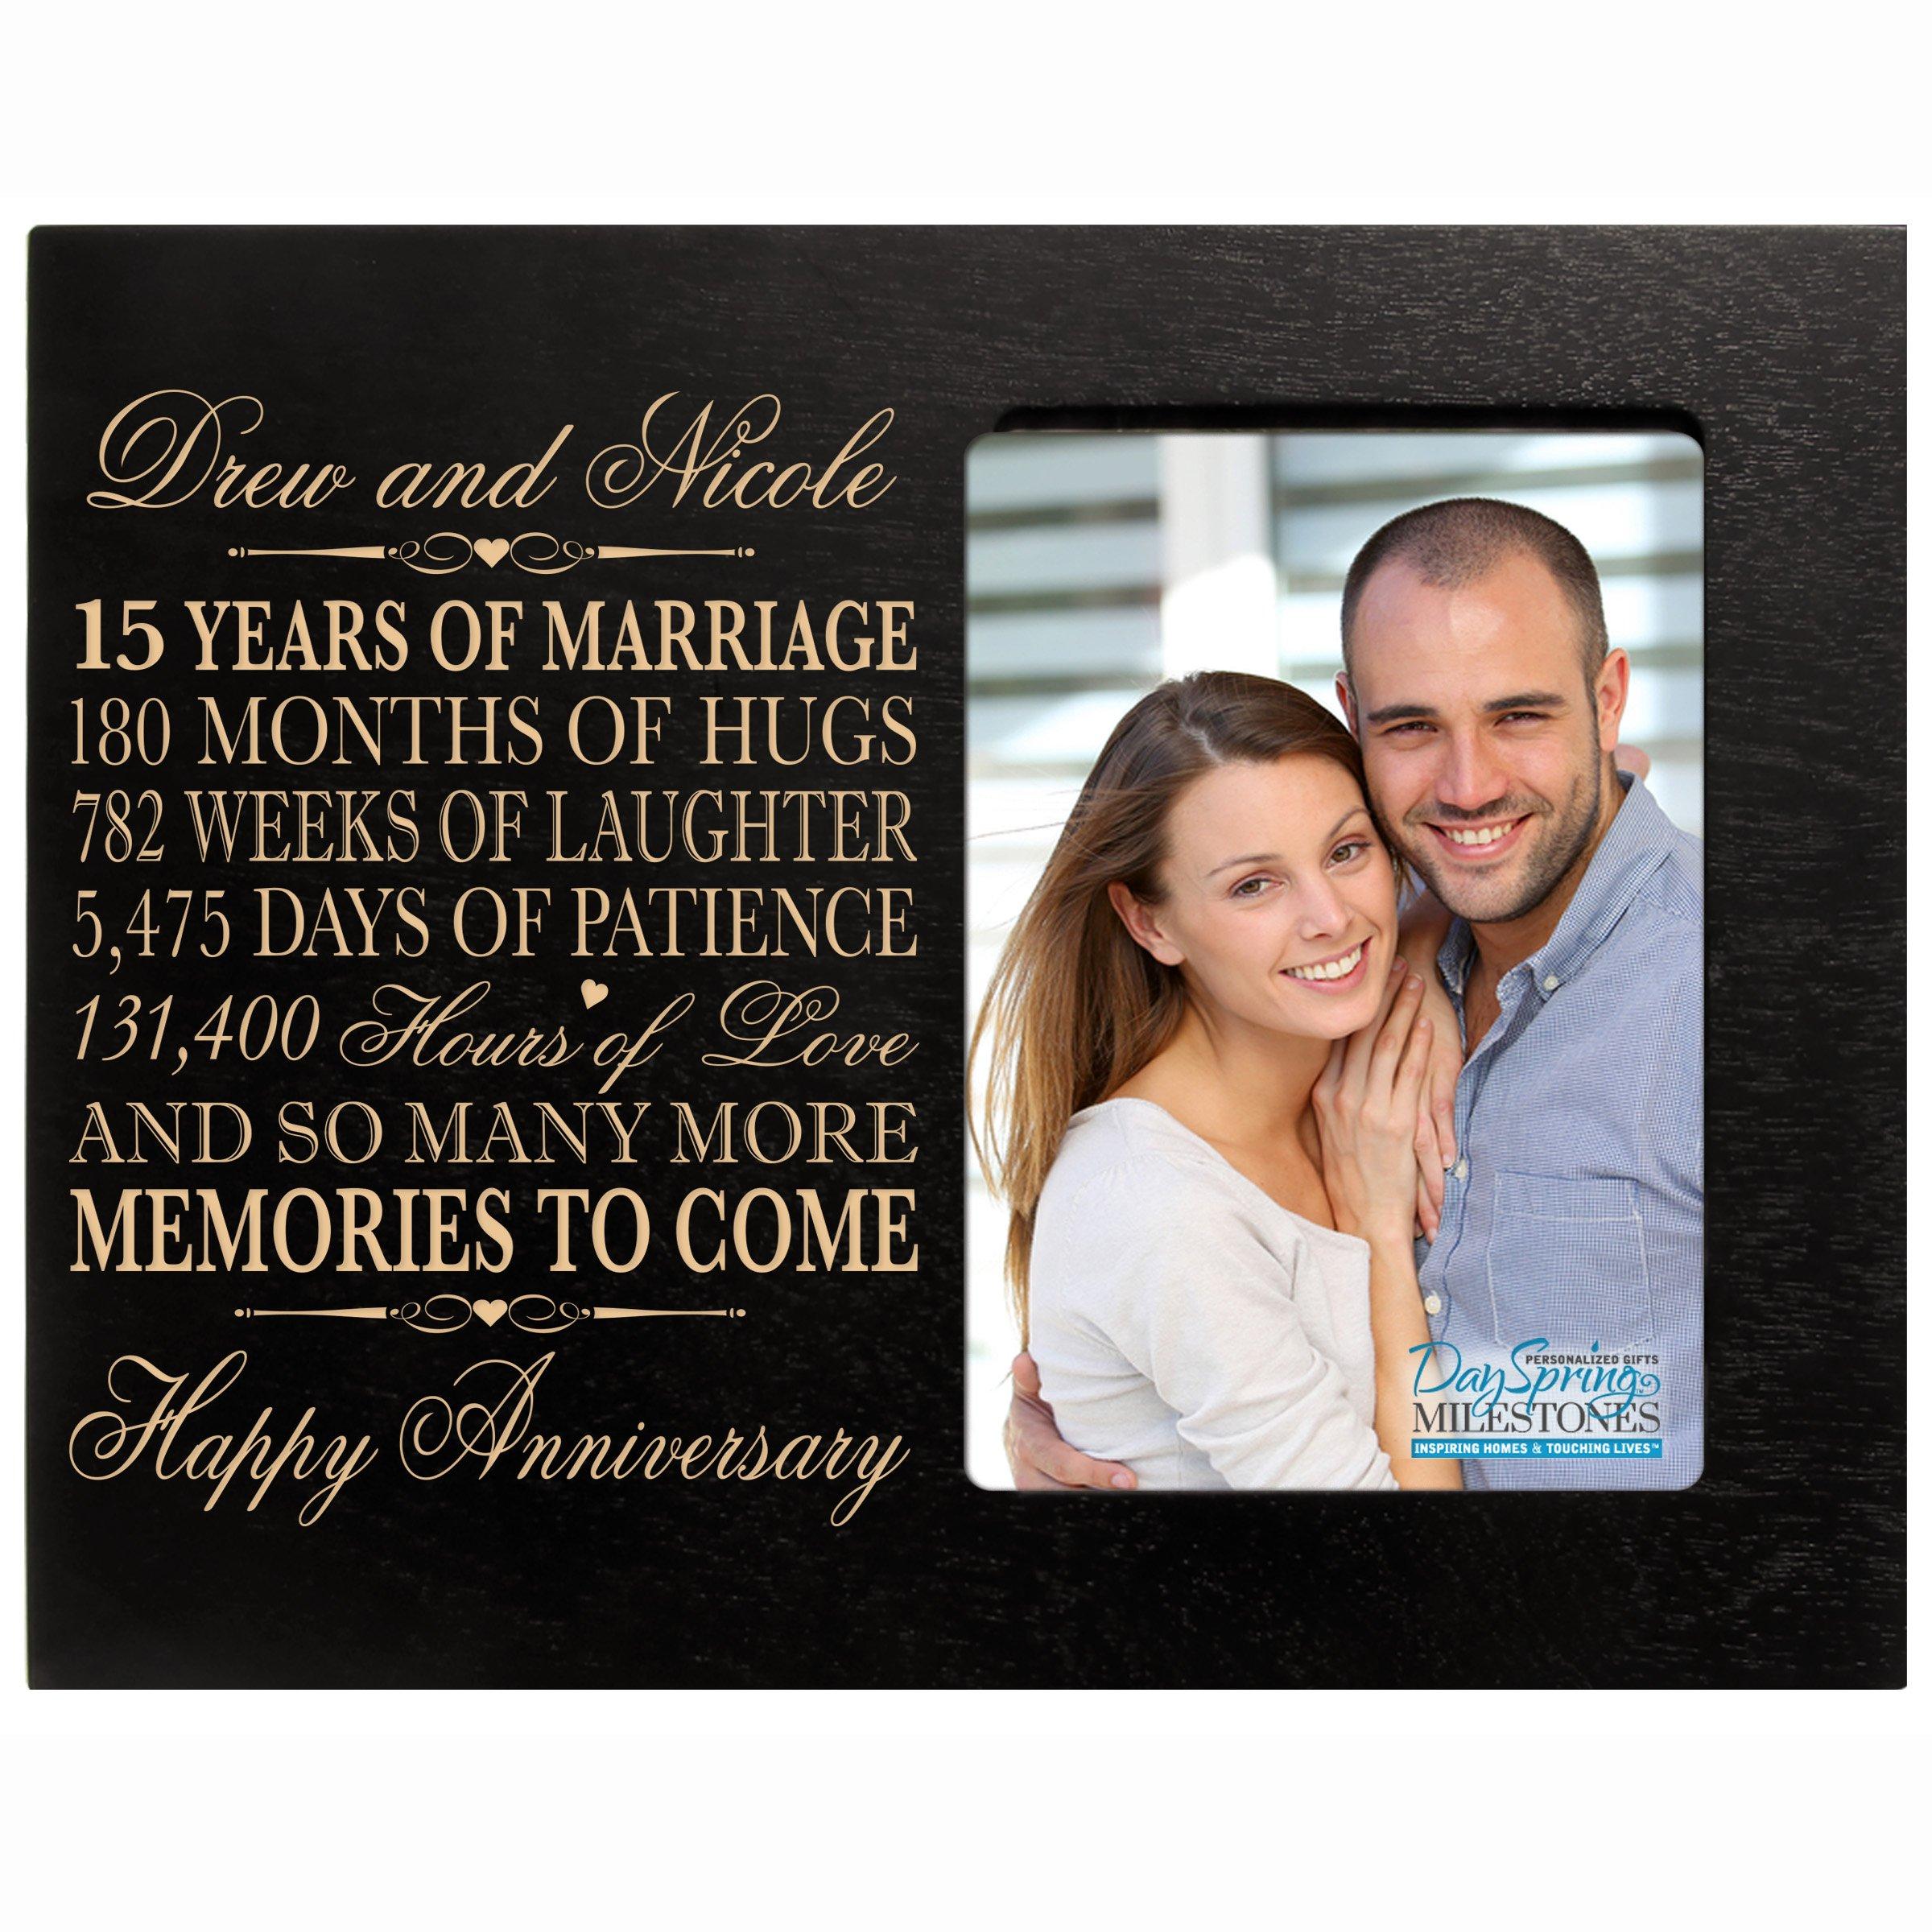 15 Year Wedding Anniversary Gift.Cheap 15 Wedding Anniversary Gift For Wife Find 15 Wedding